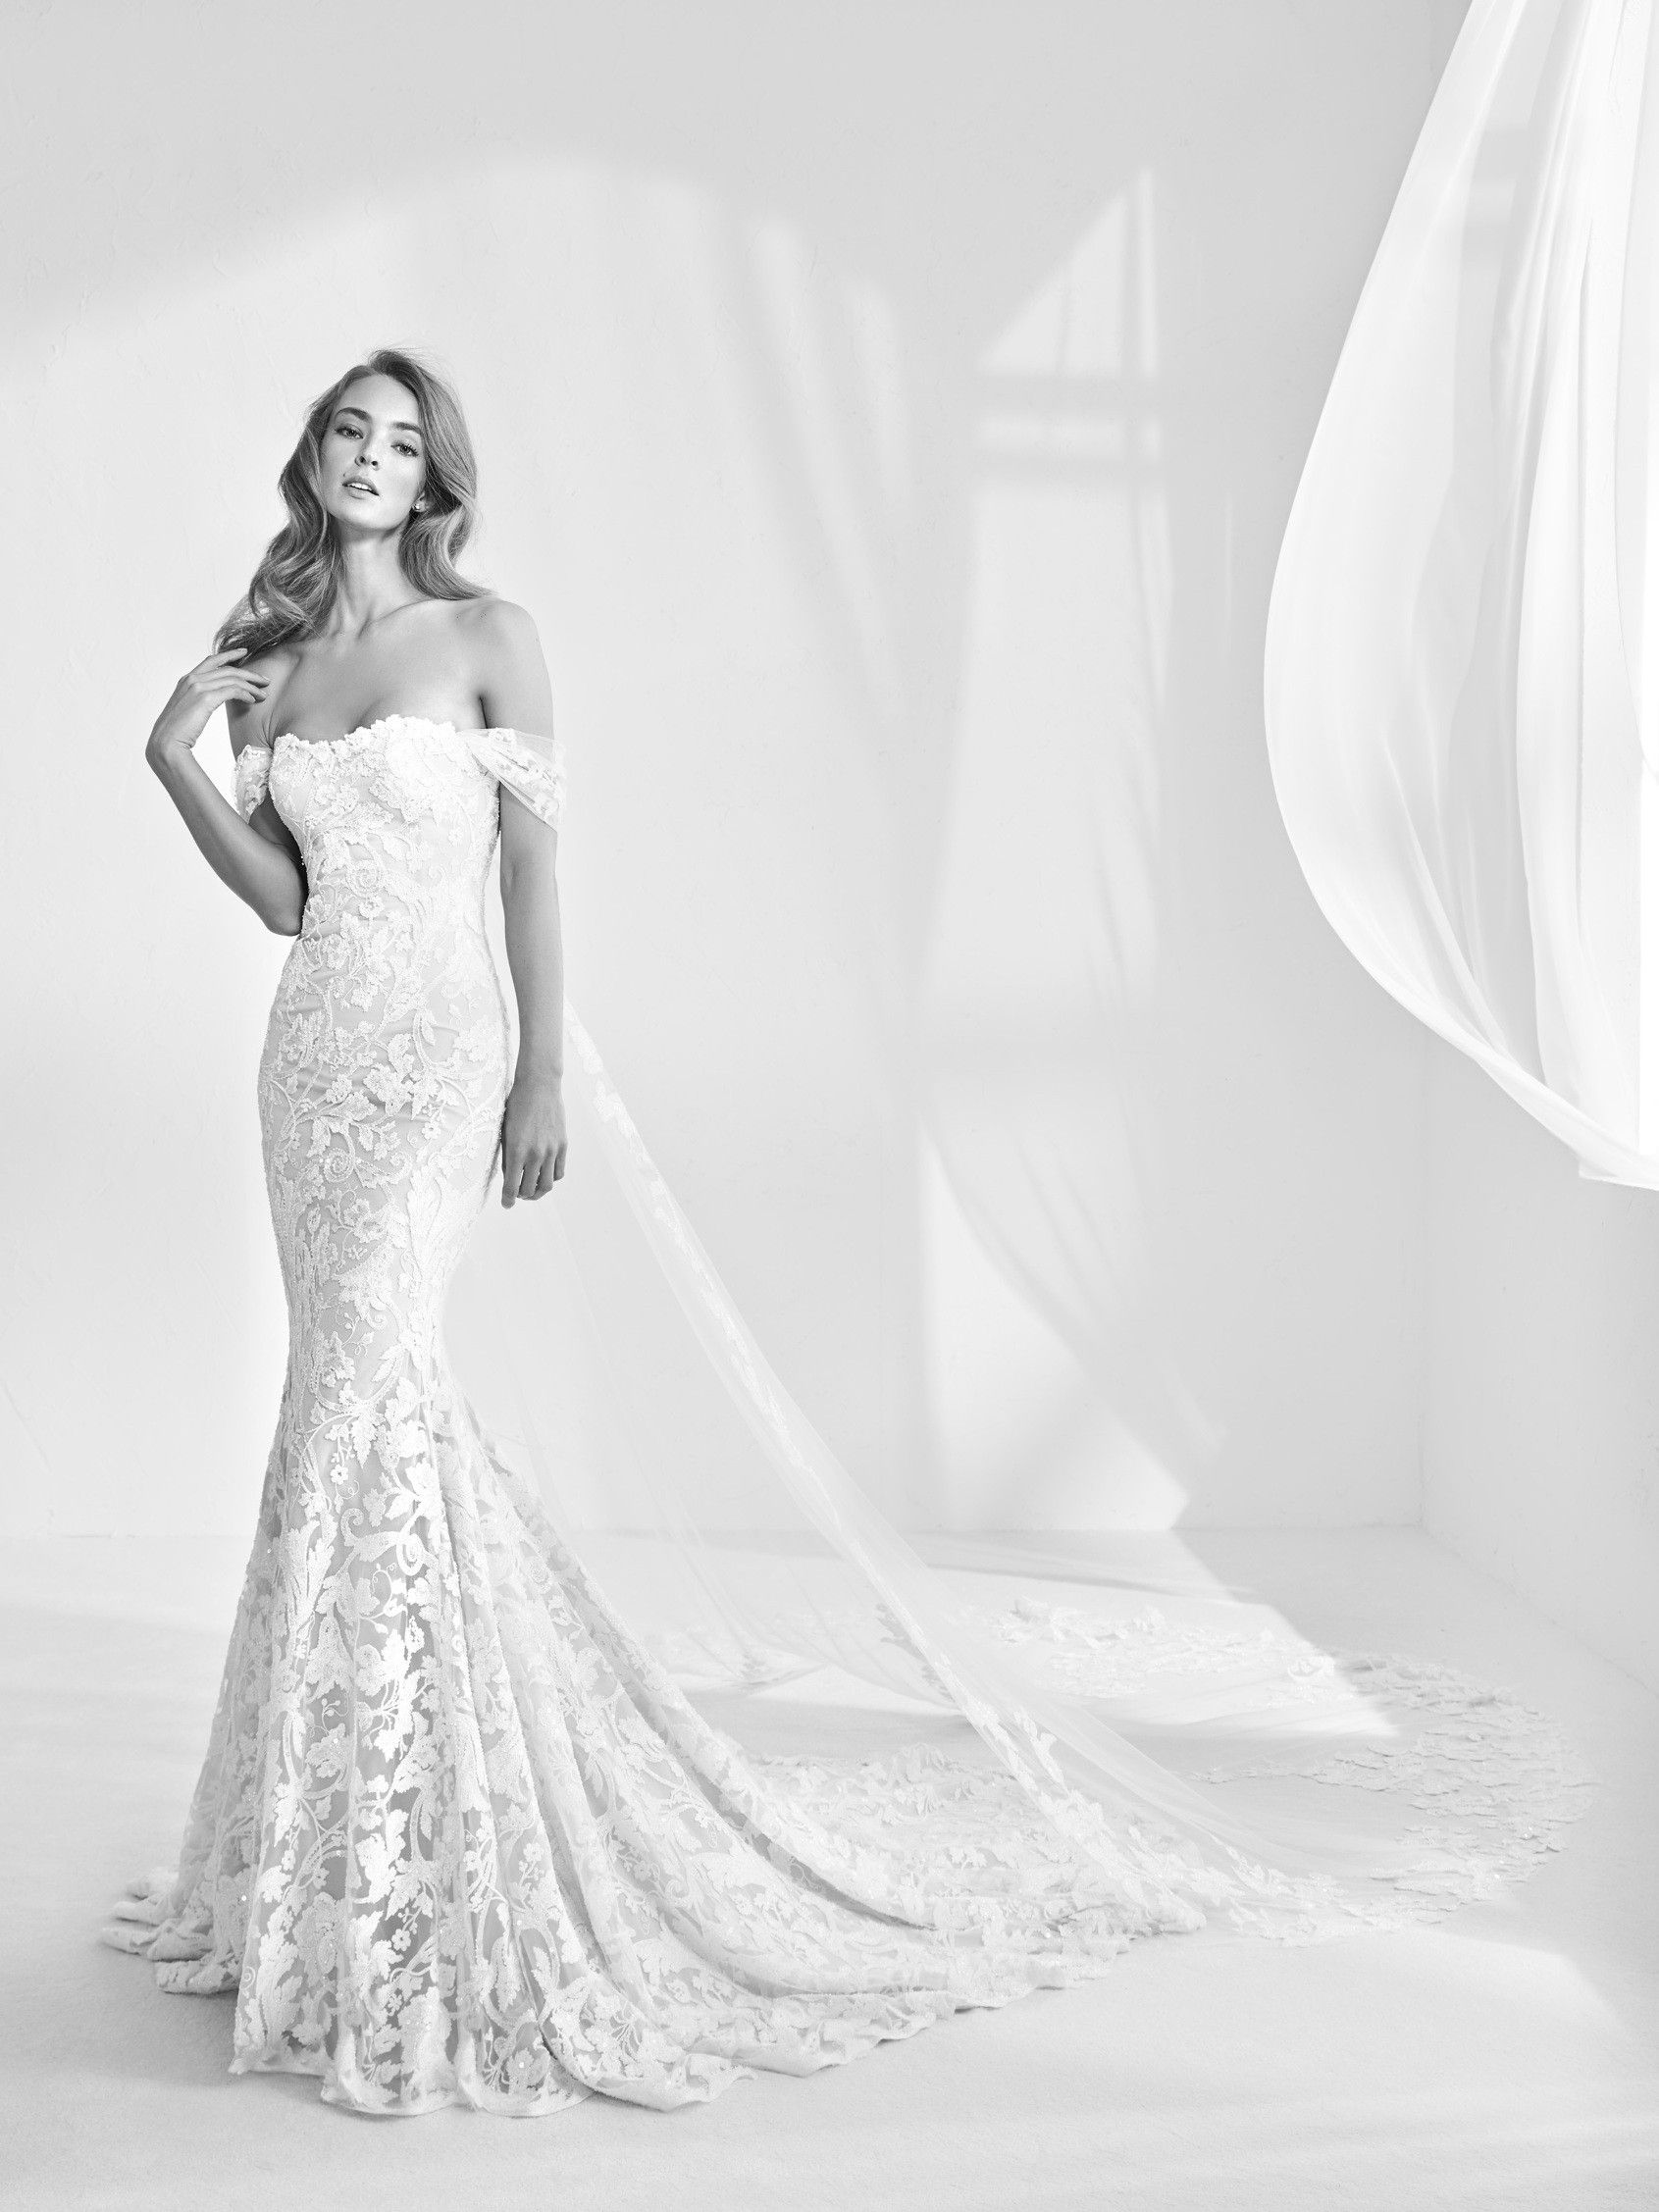 mermaid style wedding dress Mermaid style wedding dress with gemstones Rani